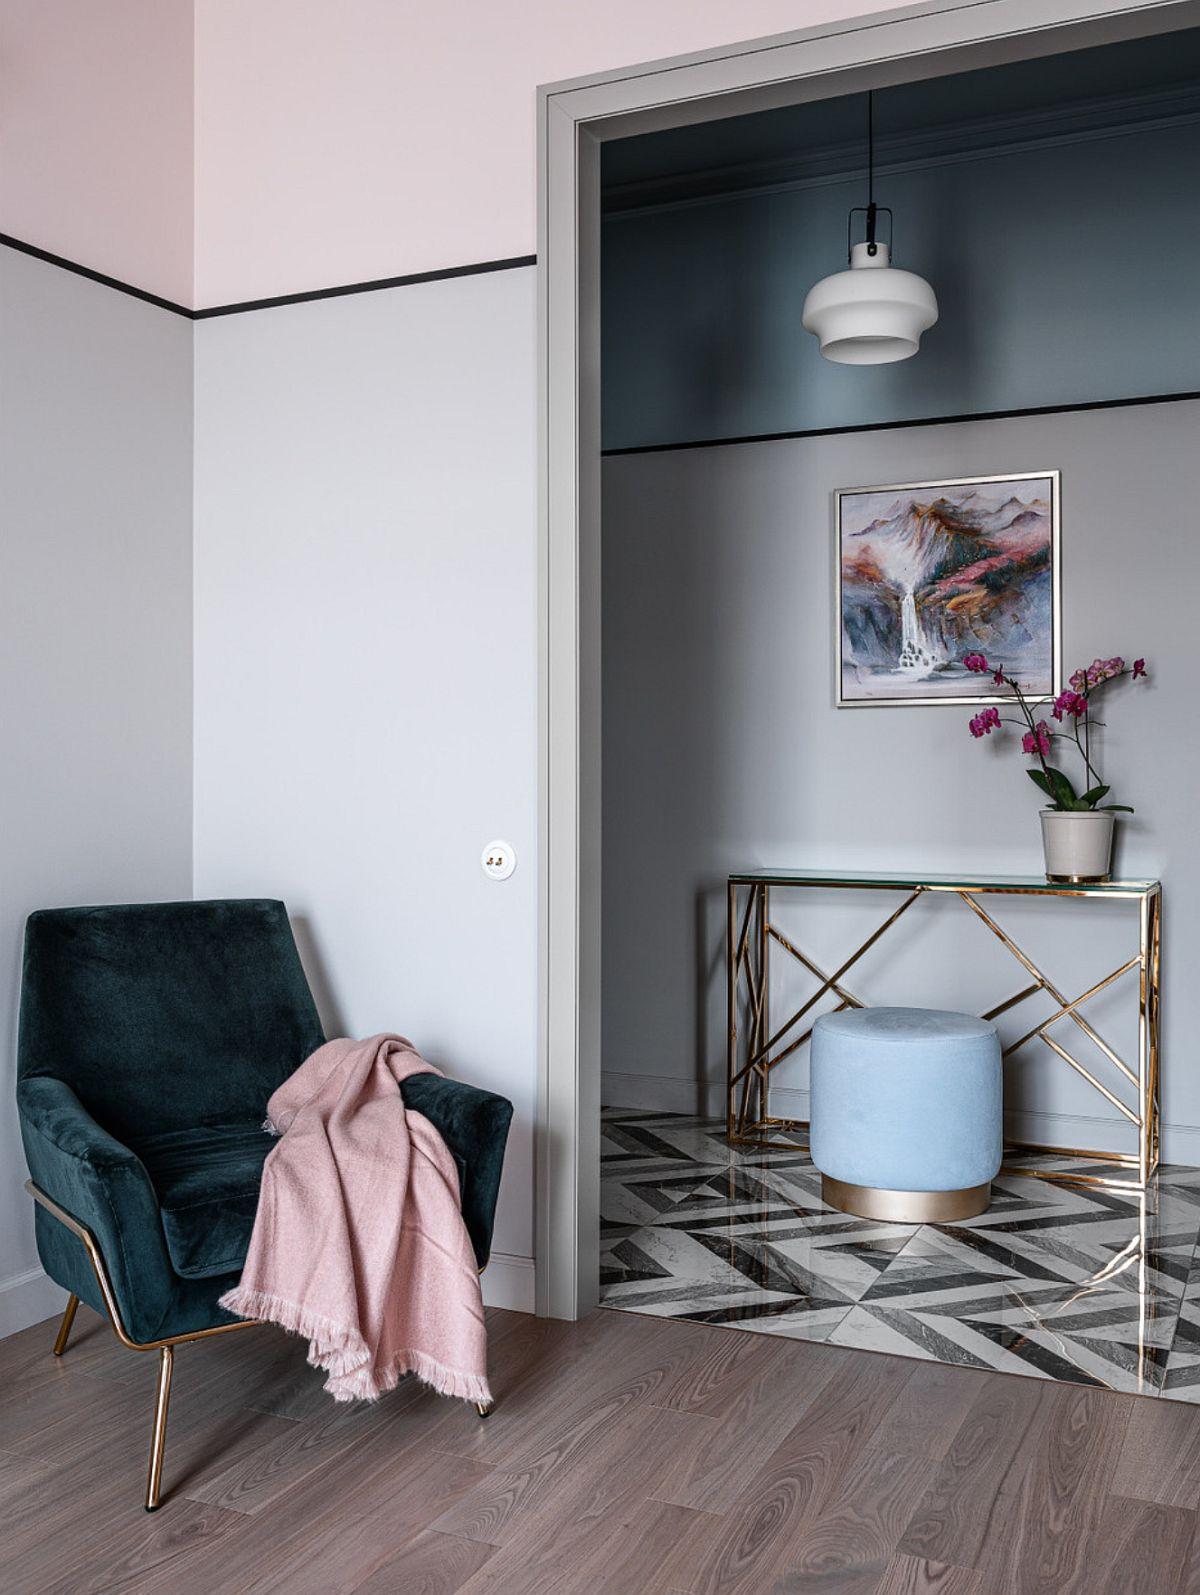 adelaparvu.com despre bucatarie cu tapet cu flori, designer Iulia Sheypunas, foto Vladimir Barabash (6)